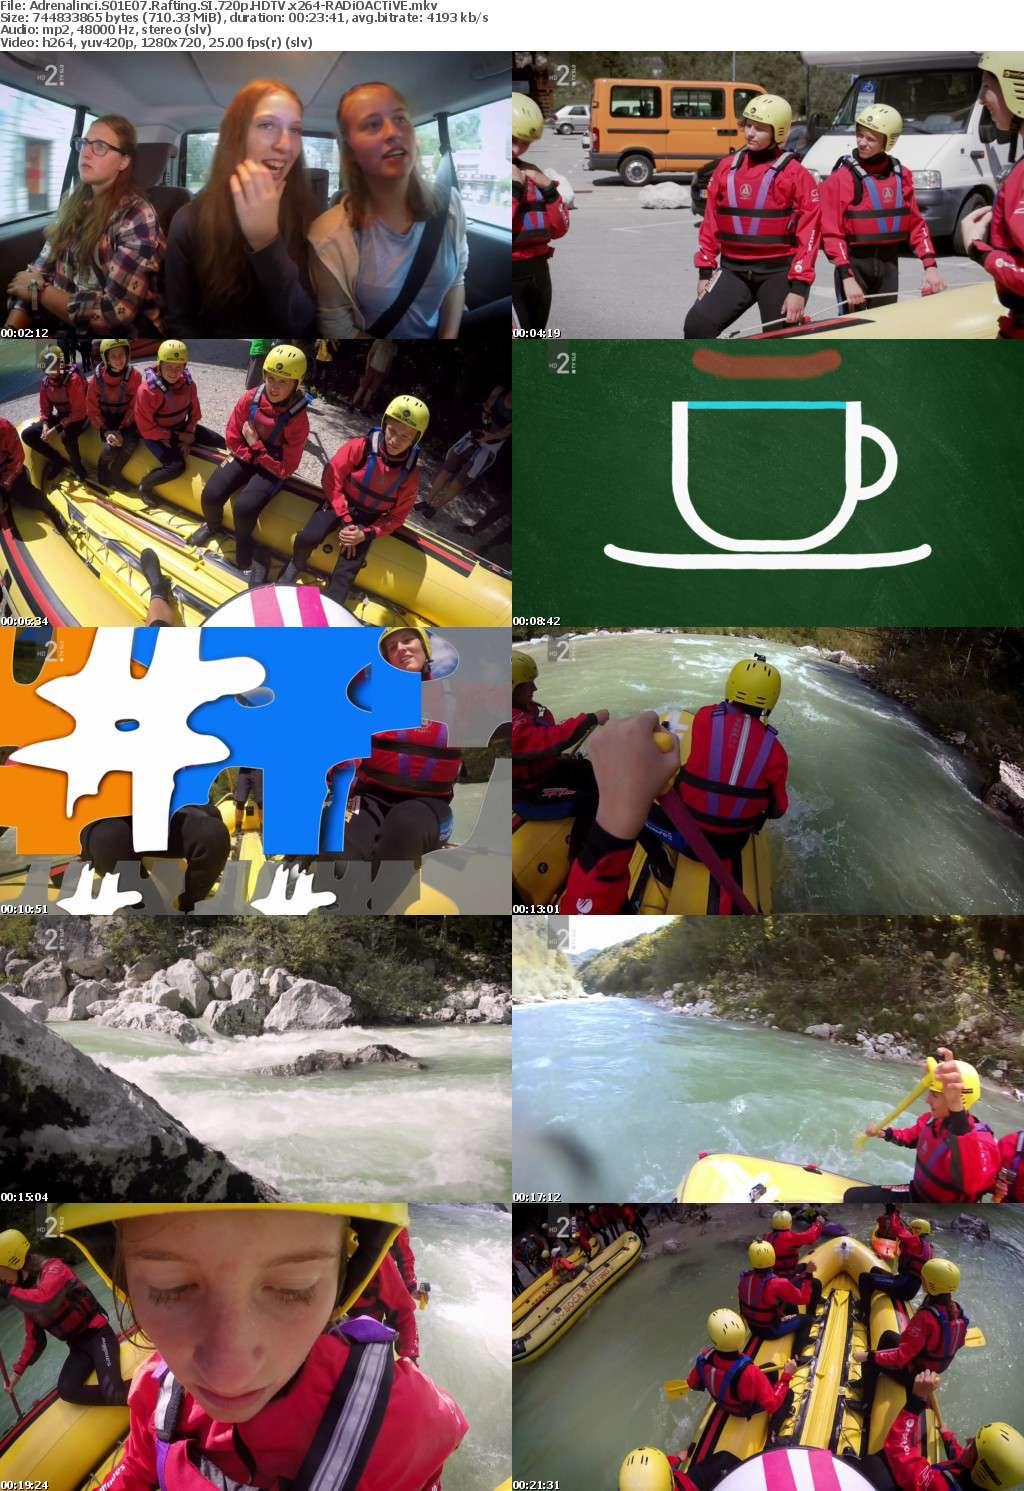 Adrenalinci S01E07 Rafting SI 720p HDTV x264-RADiOACTiVE